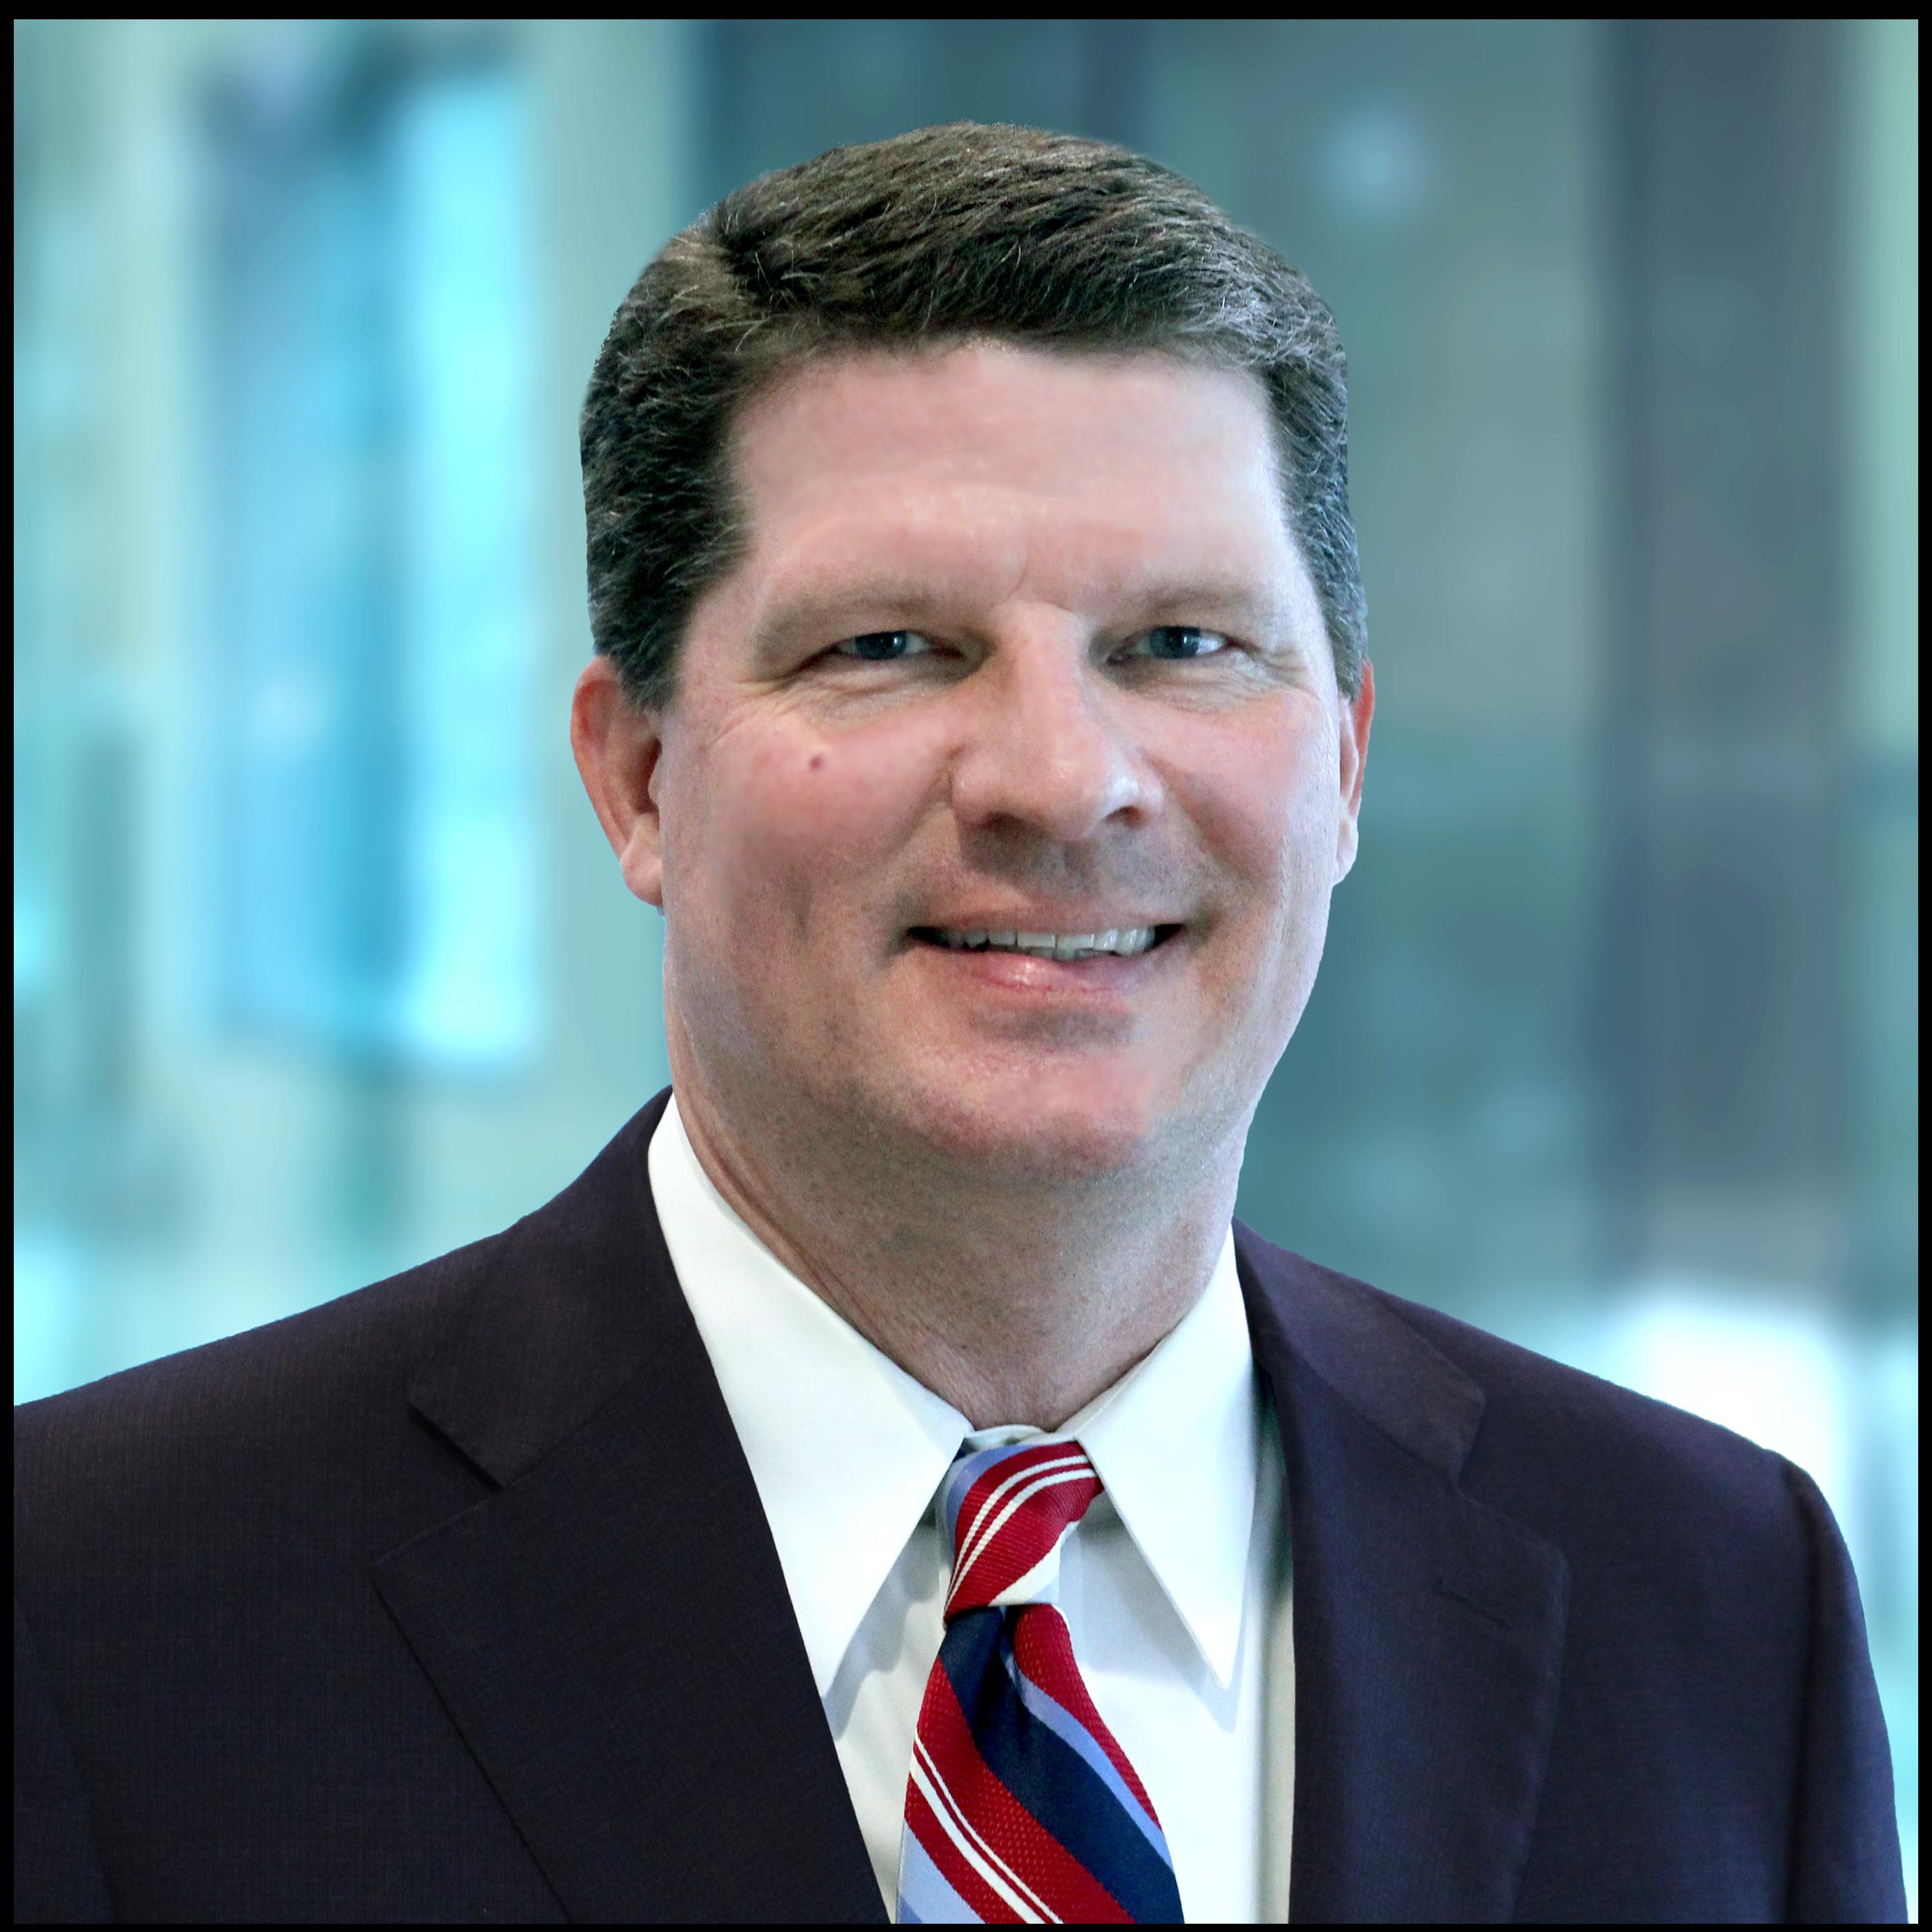 Glen Rives, JD, CFP®